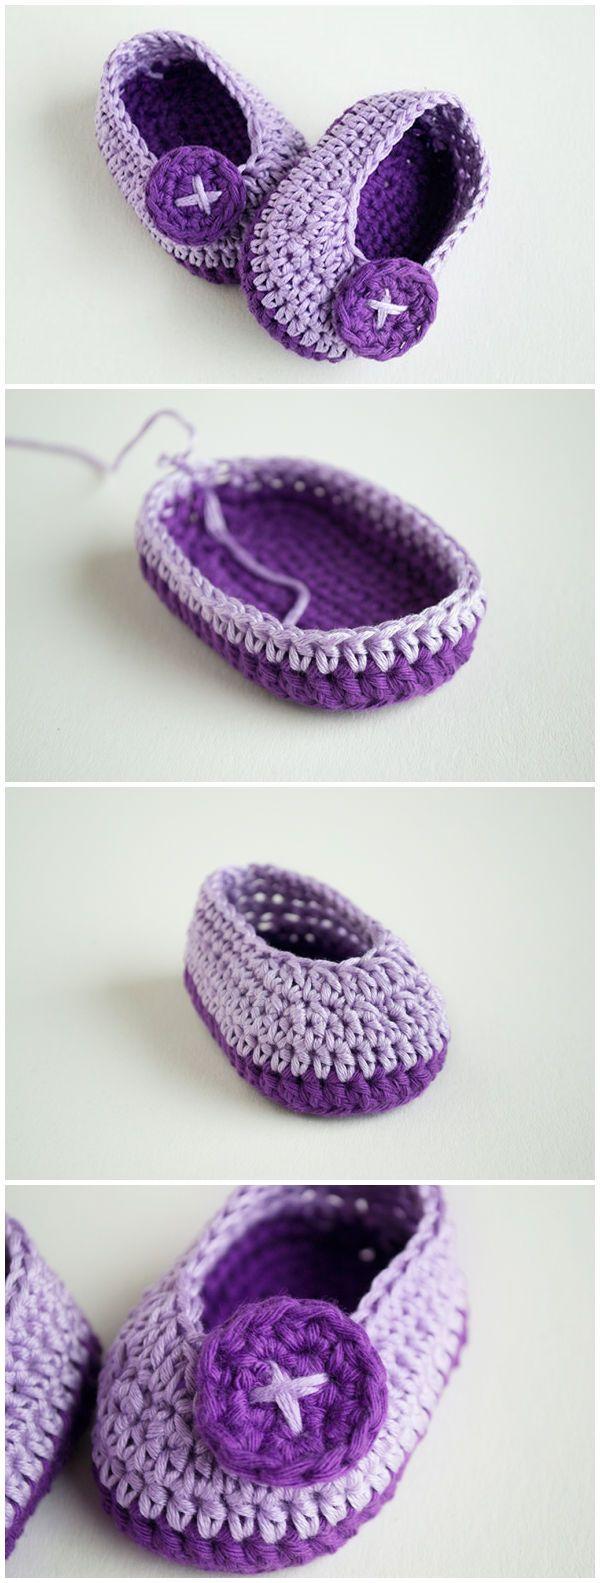 Mejores 230 imágenes de Crocheting It NOW!! en Pinterest | Vestidos ...